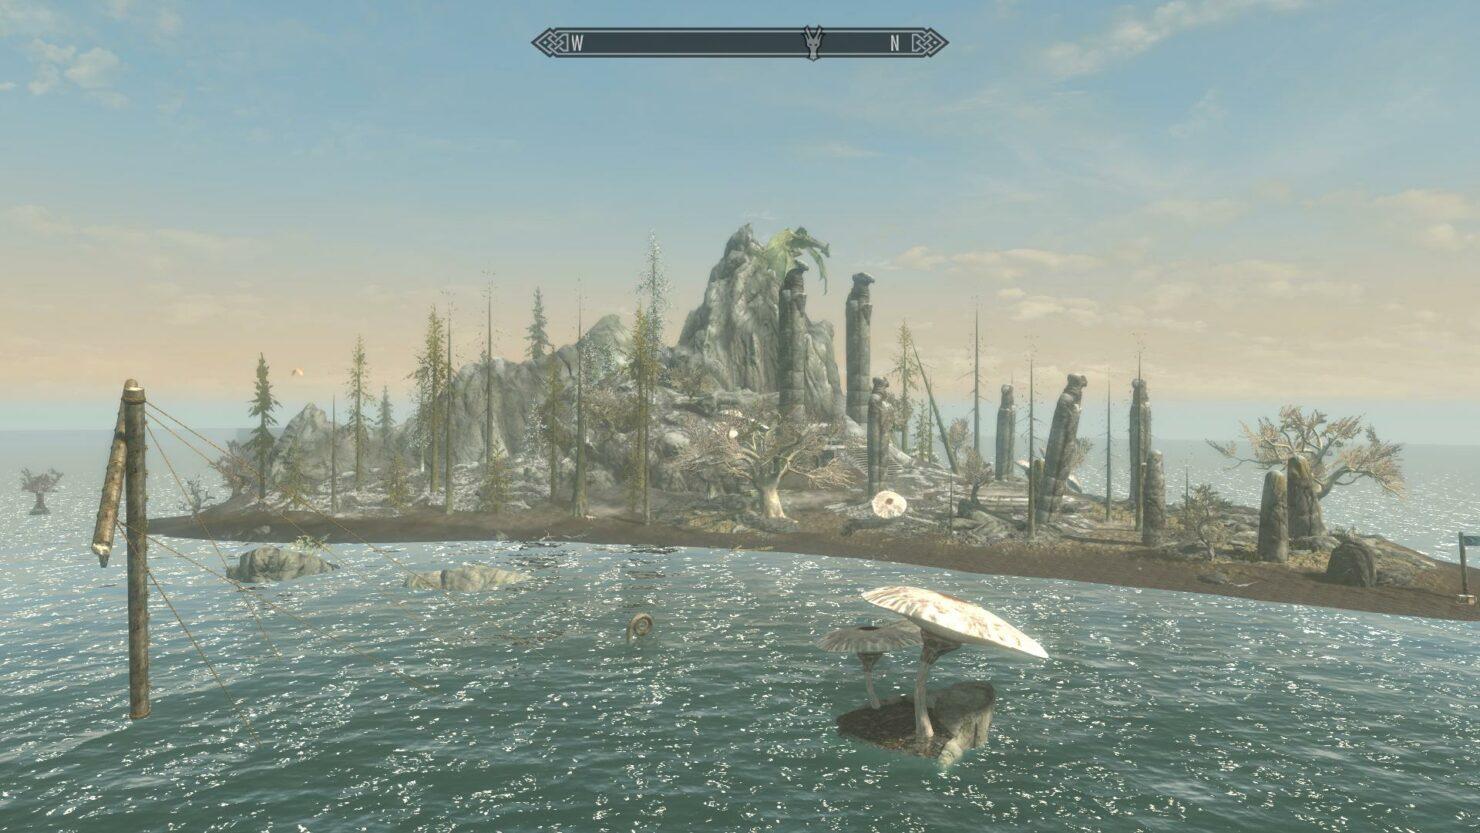 witcher-3-inspired-skyrim-fan-expansion-land-of-vominheim-5